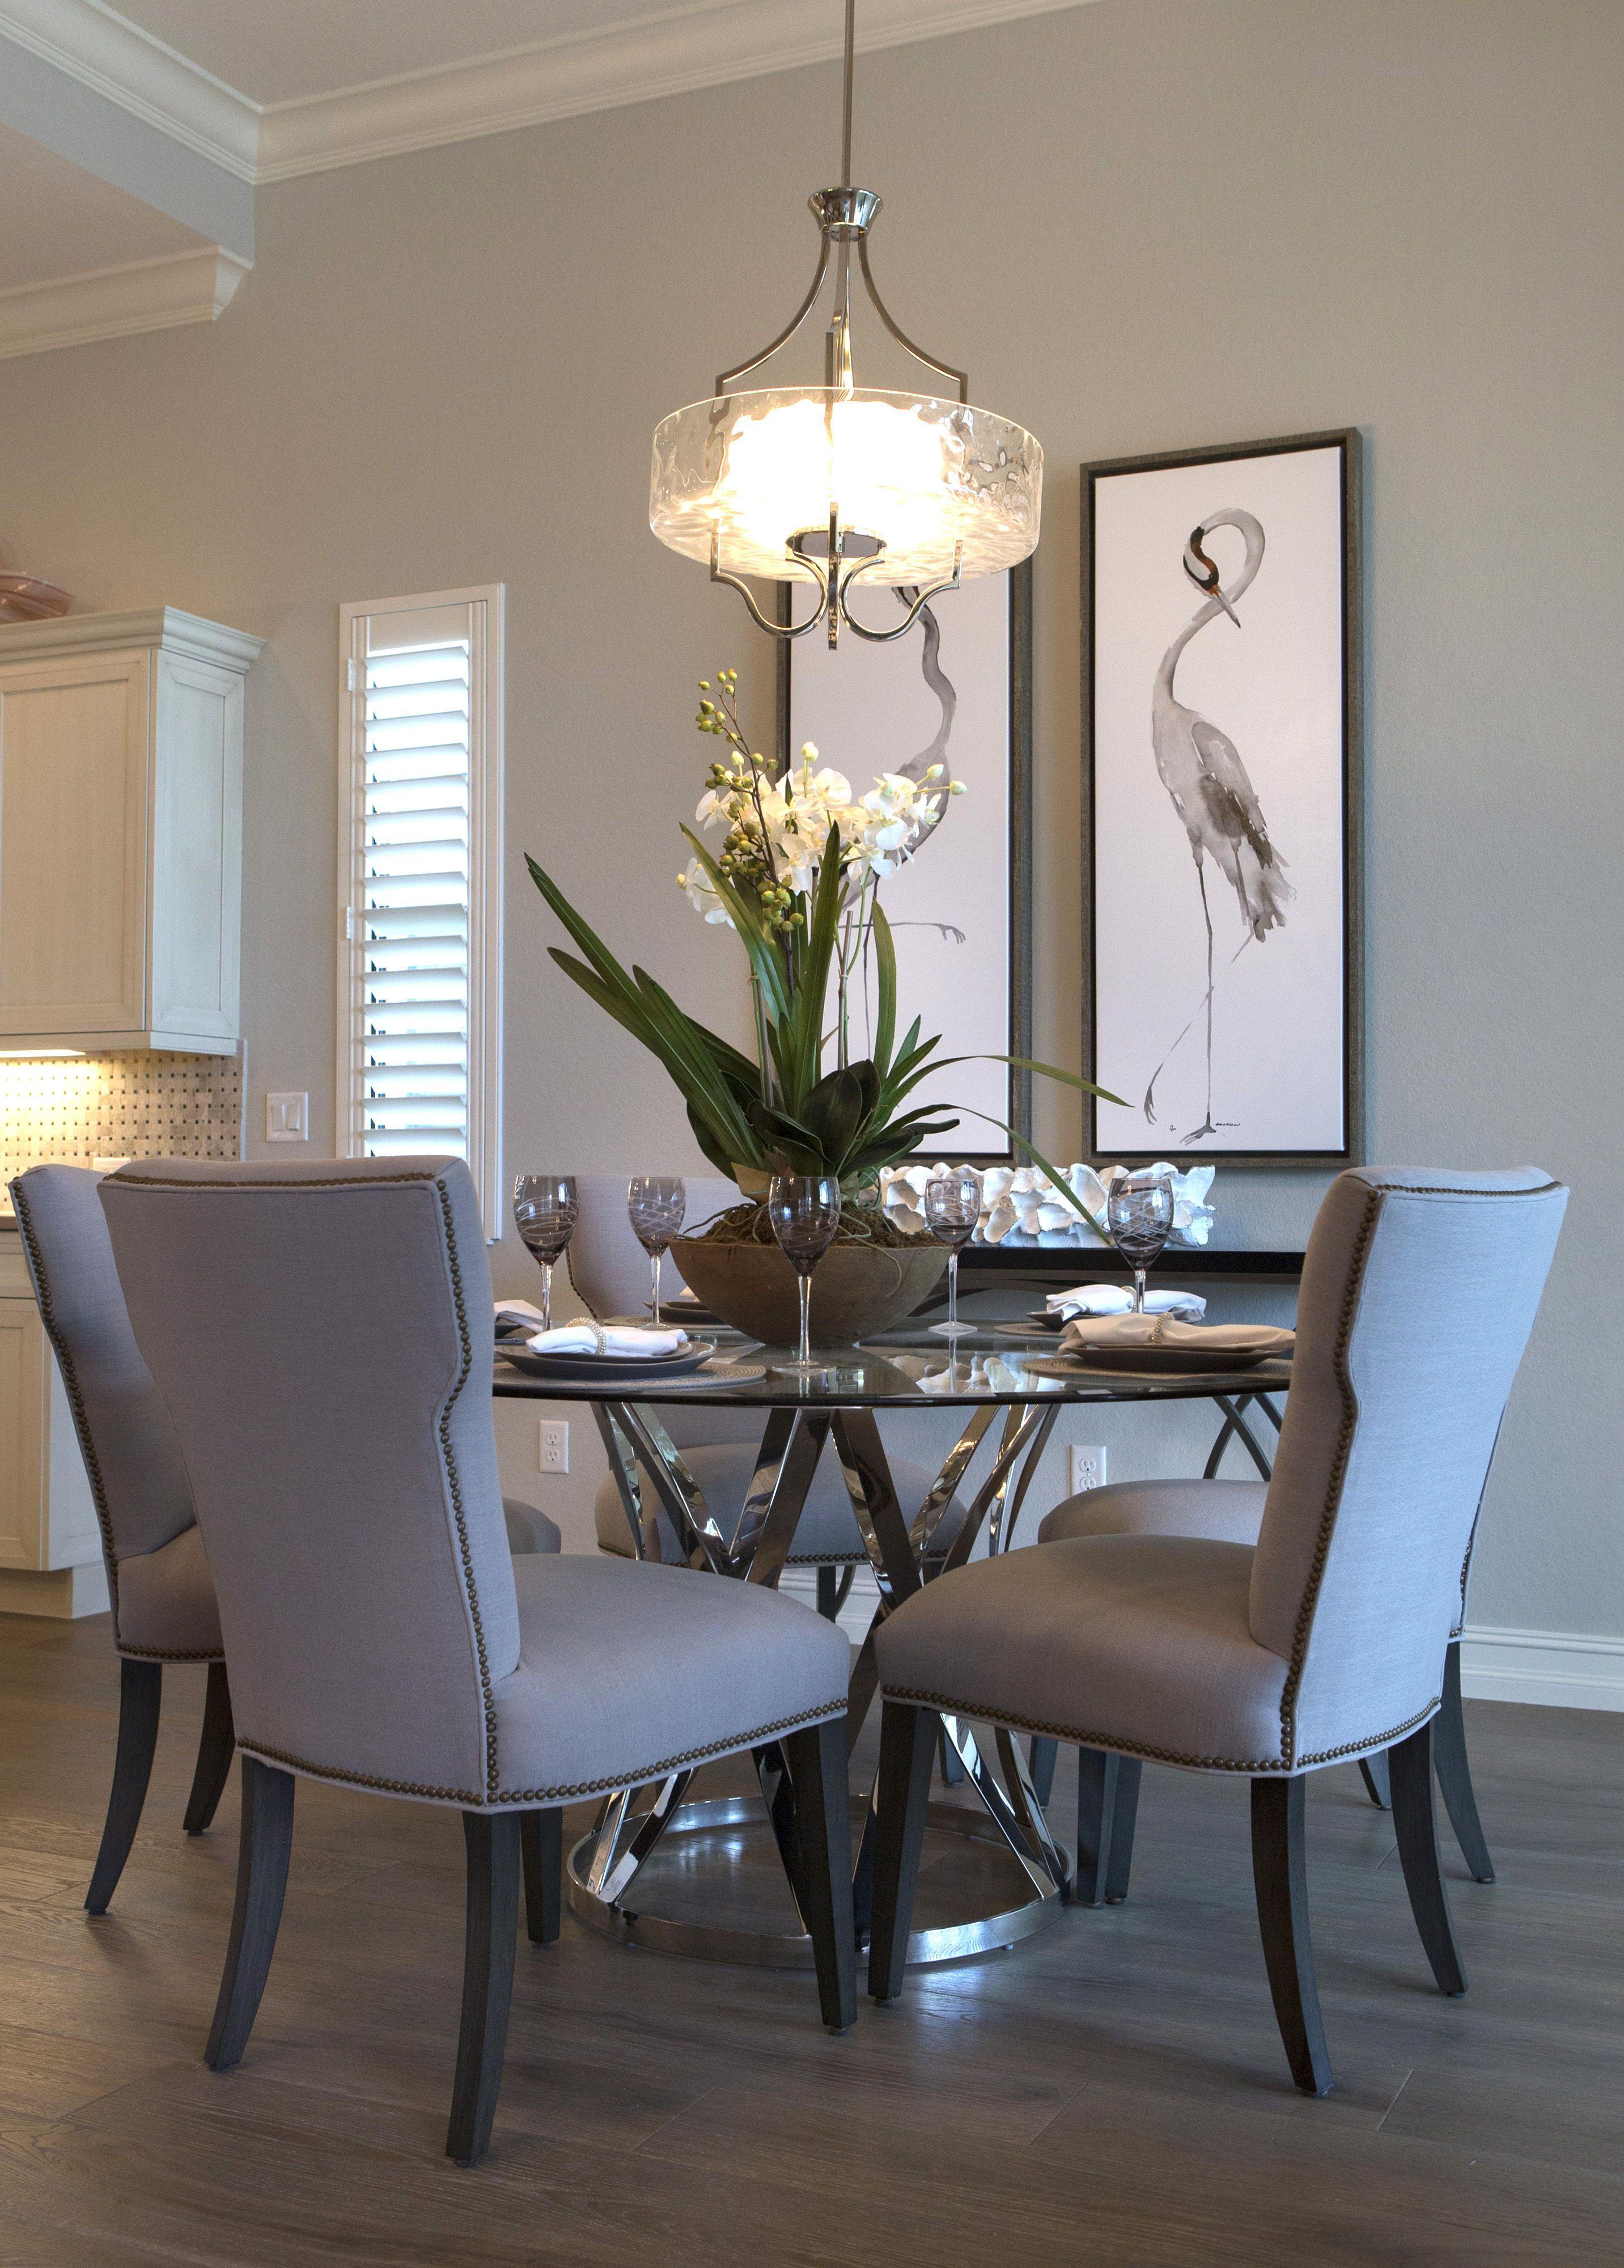 Floor Paint Cabinets Backsplash Dining Room Small Dining